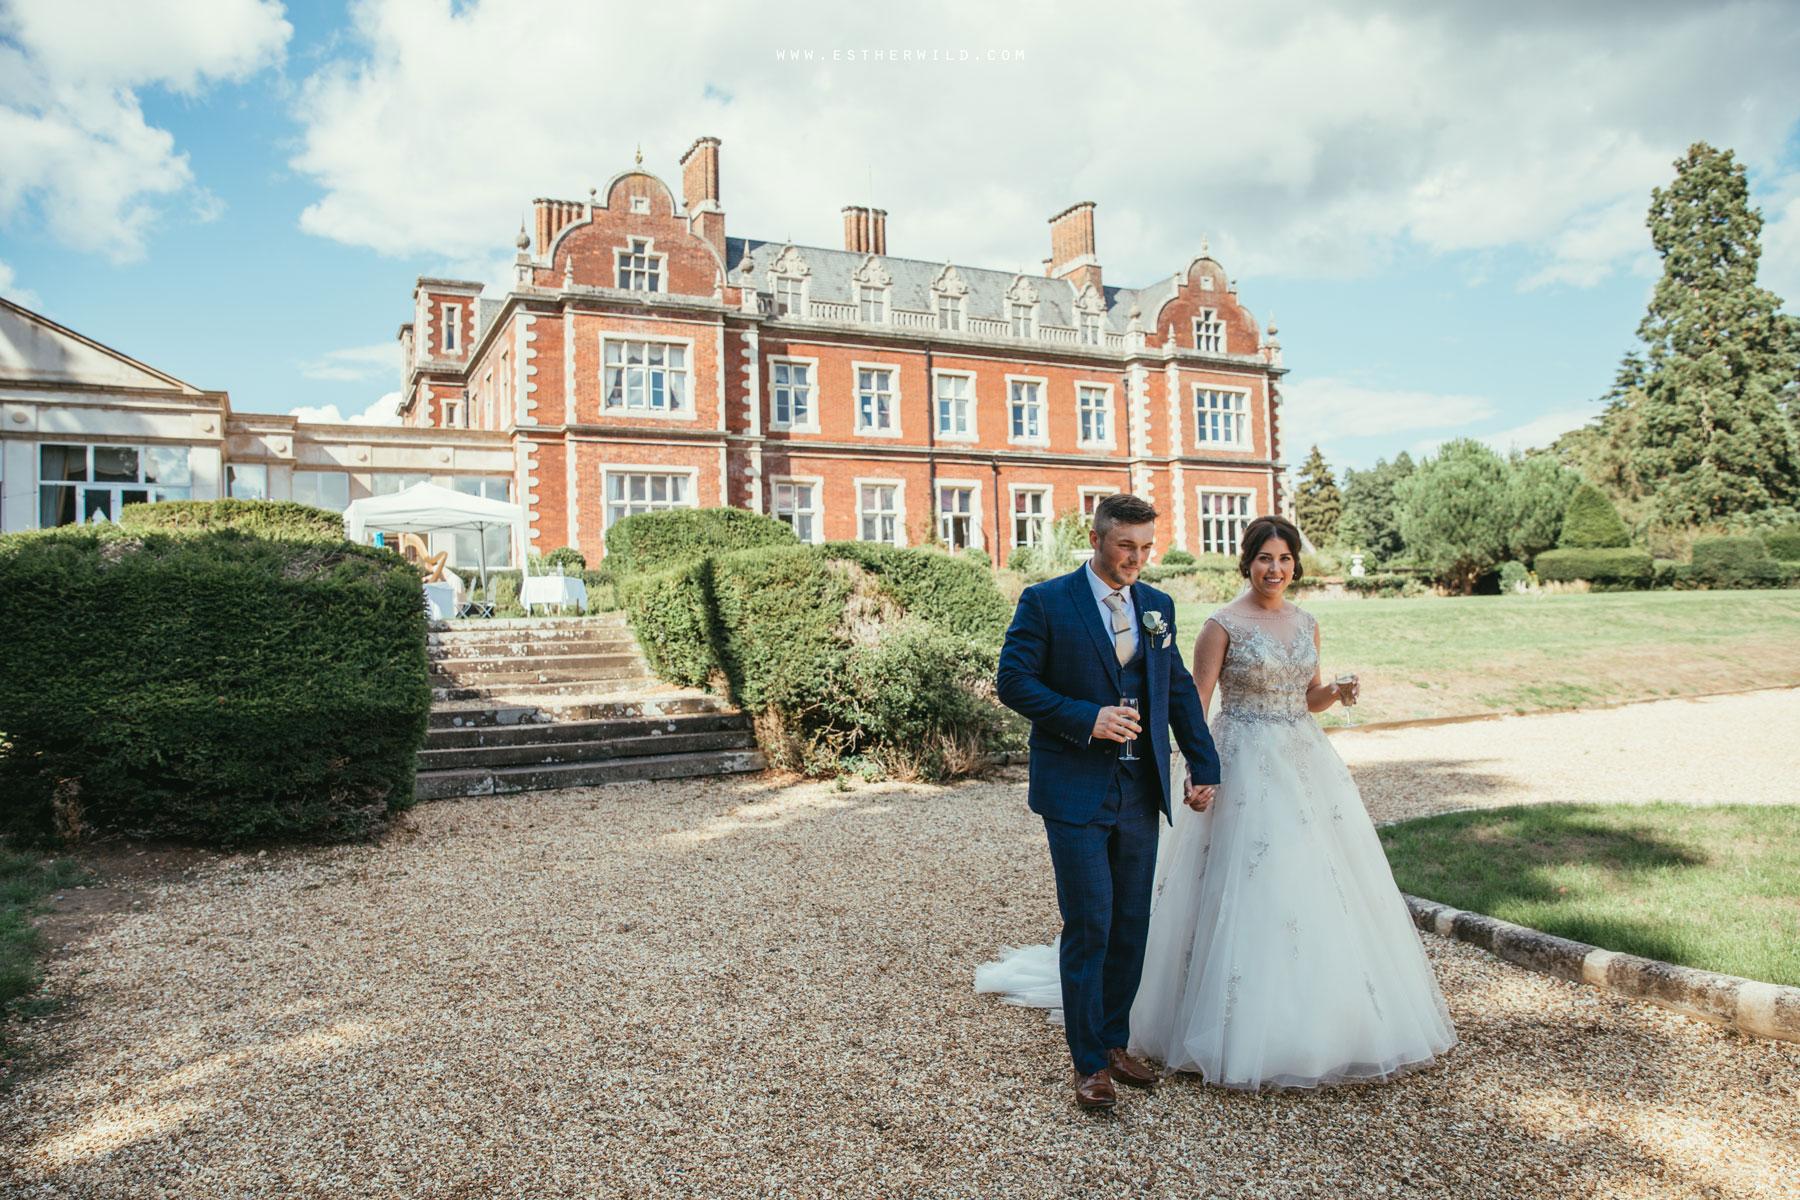 Lynford_Hall_Wedding_Thetford_Mundford_Esther_Wild_Photographer_IMG_1676.jpg